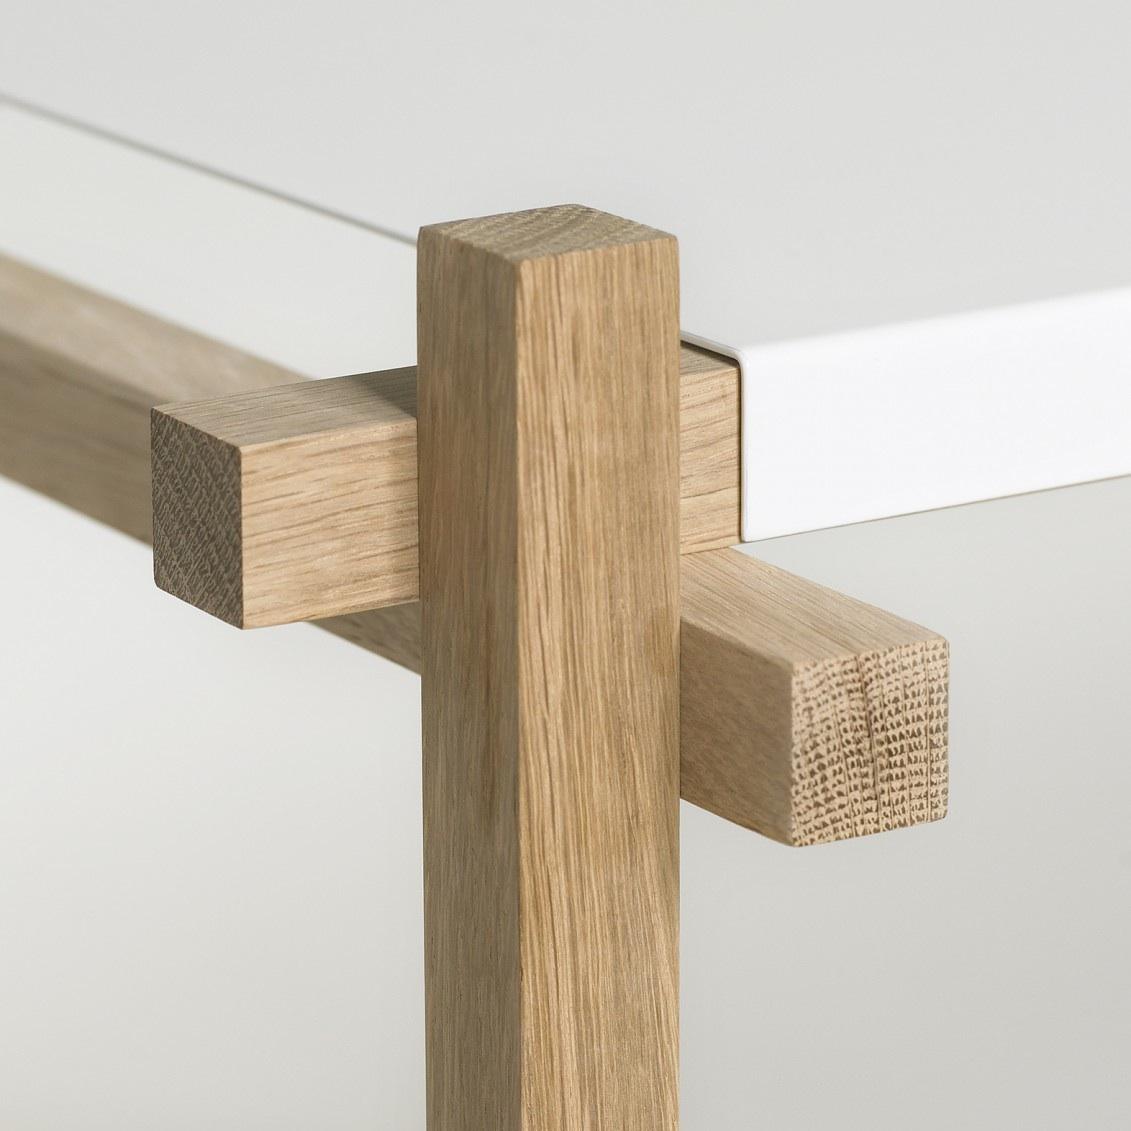 hay woody high kast the shop online herentals. Black Bedroom Furniture Sets. Home Design Ideas